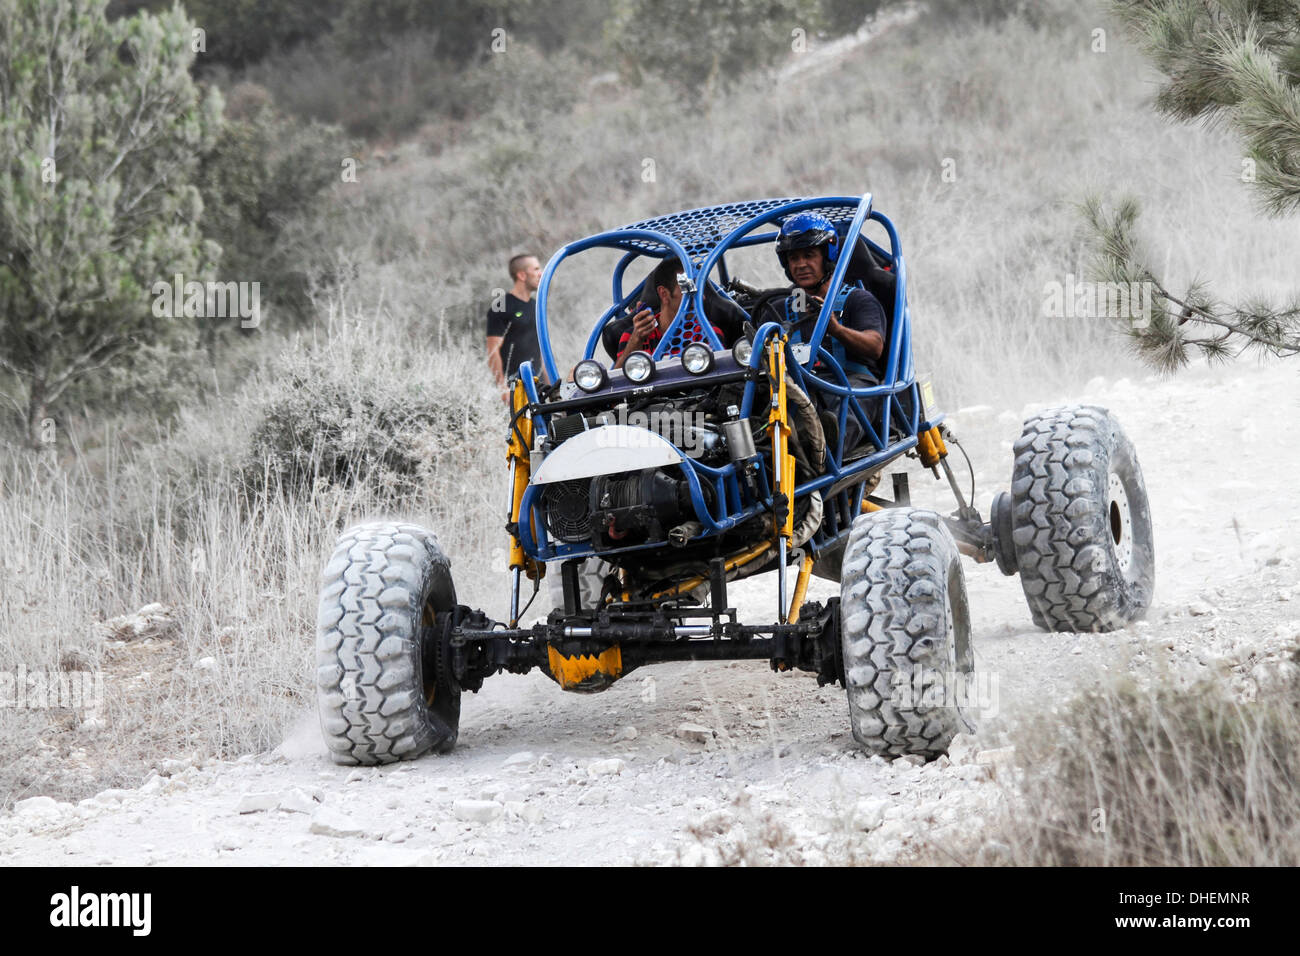 Cross Country Rally. Ein Buggy Rennen. Fotografiert in Israel Stockbild